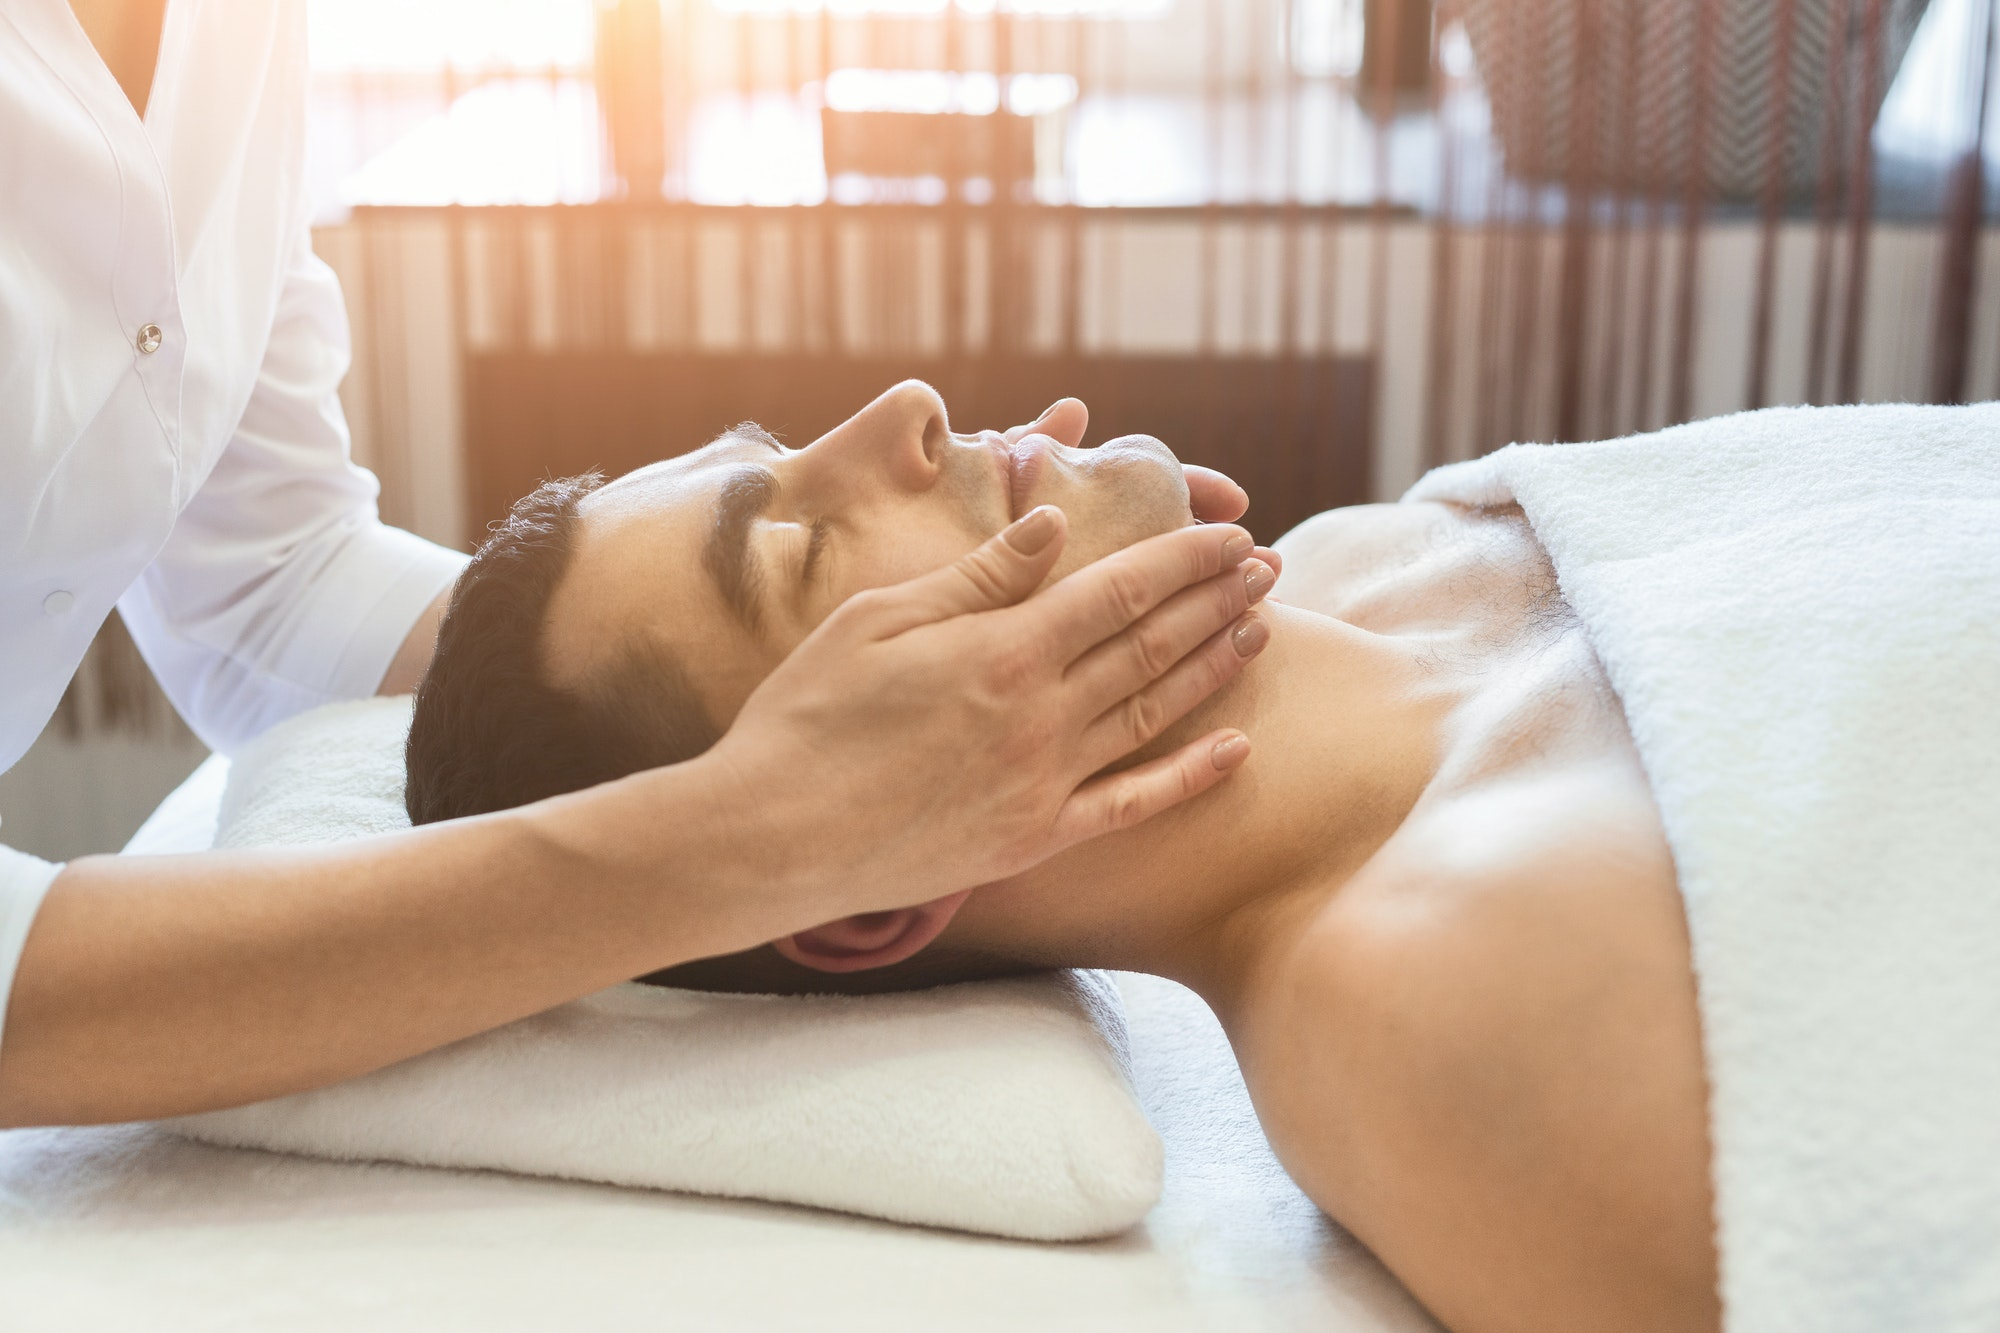 Man getting professional facial massage at spa salon